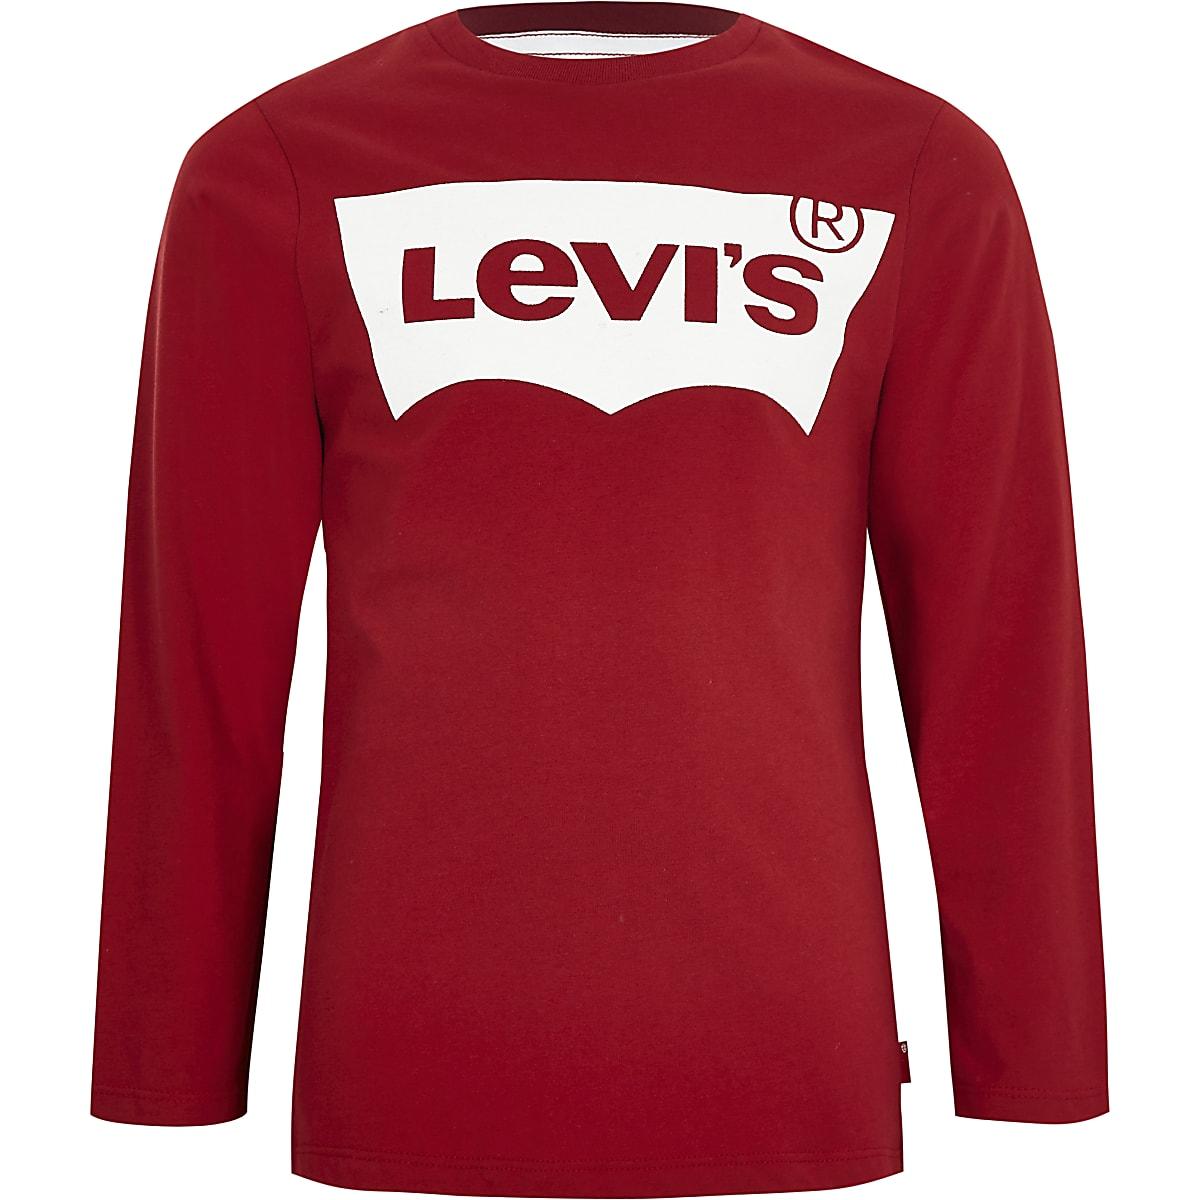 en soldes 7b7ef e6991 Boys Levi's red long sleeve T-shirt